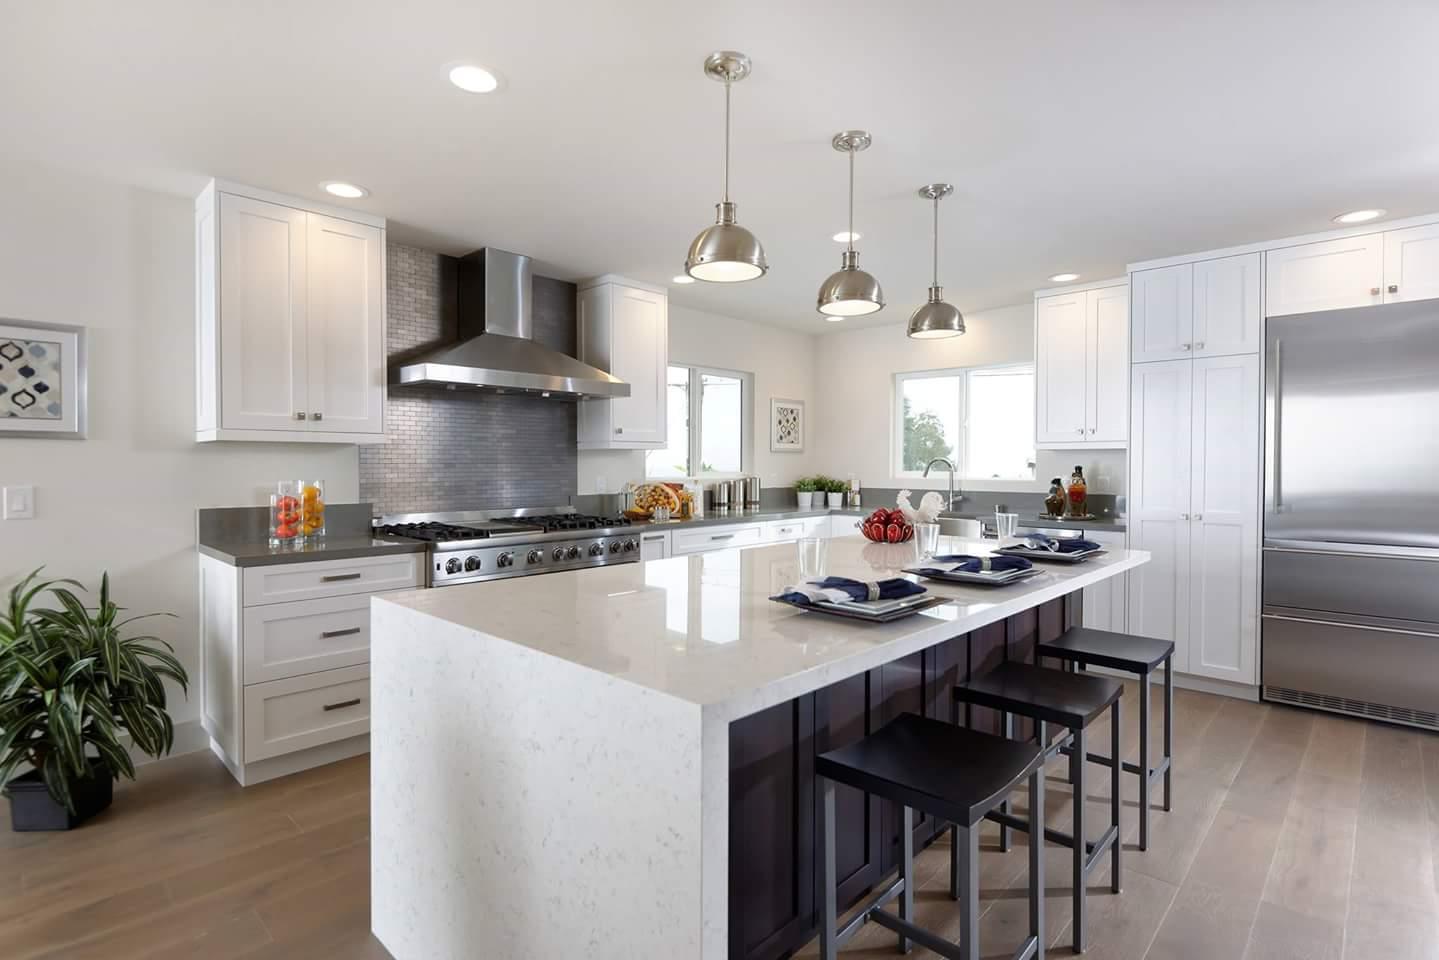 Countertops San Diego Custom Fabrication And Installation Of Luxury Quartz And Granite